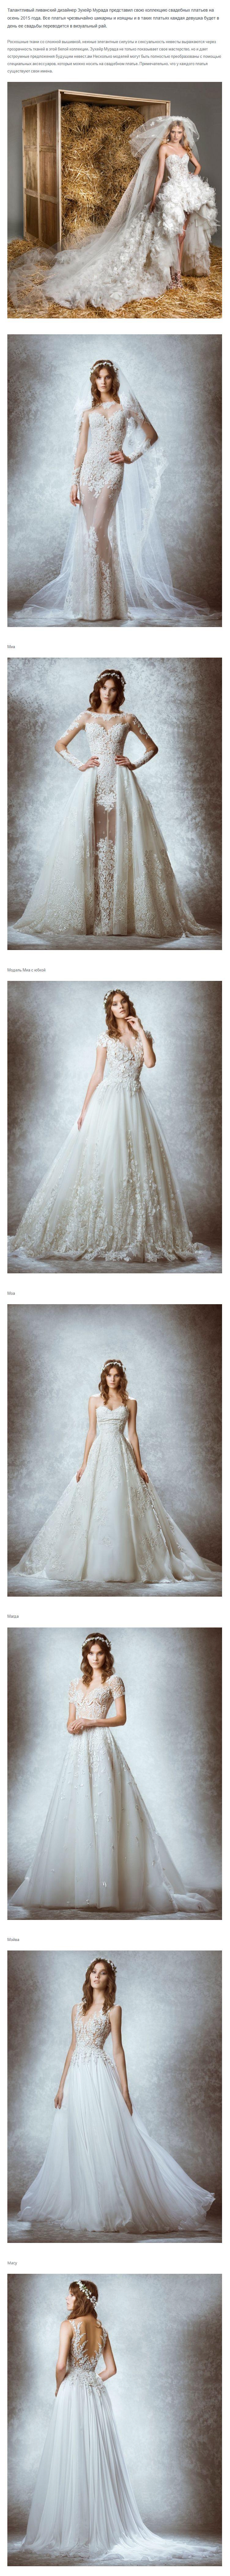 Свадебная коллекция осени 2015 года от Зухейра Мурада